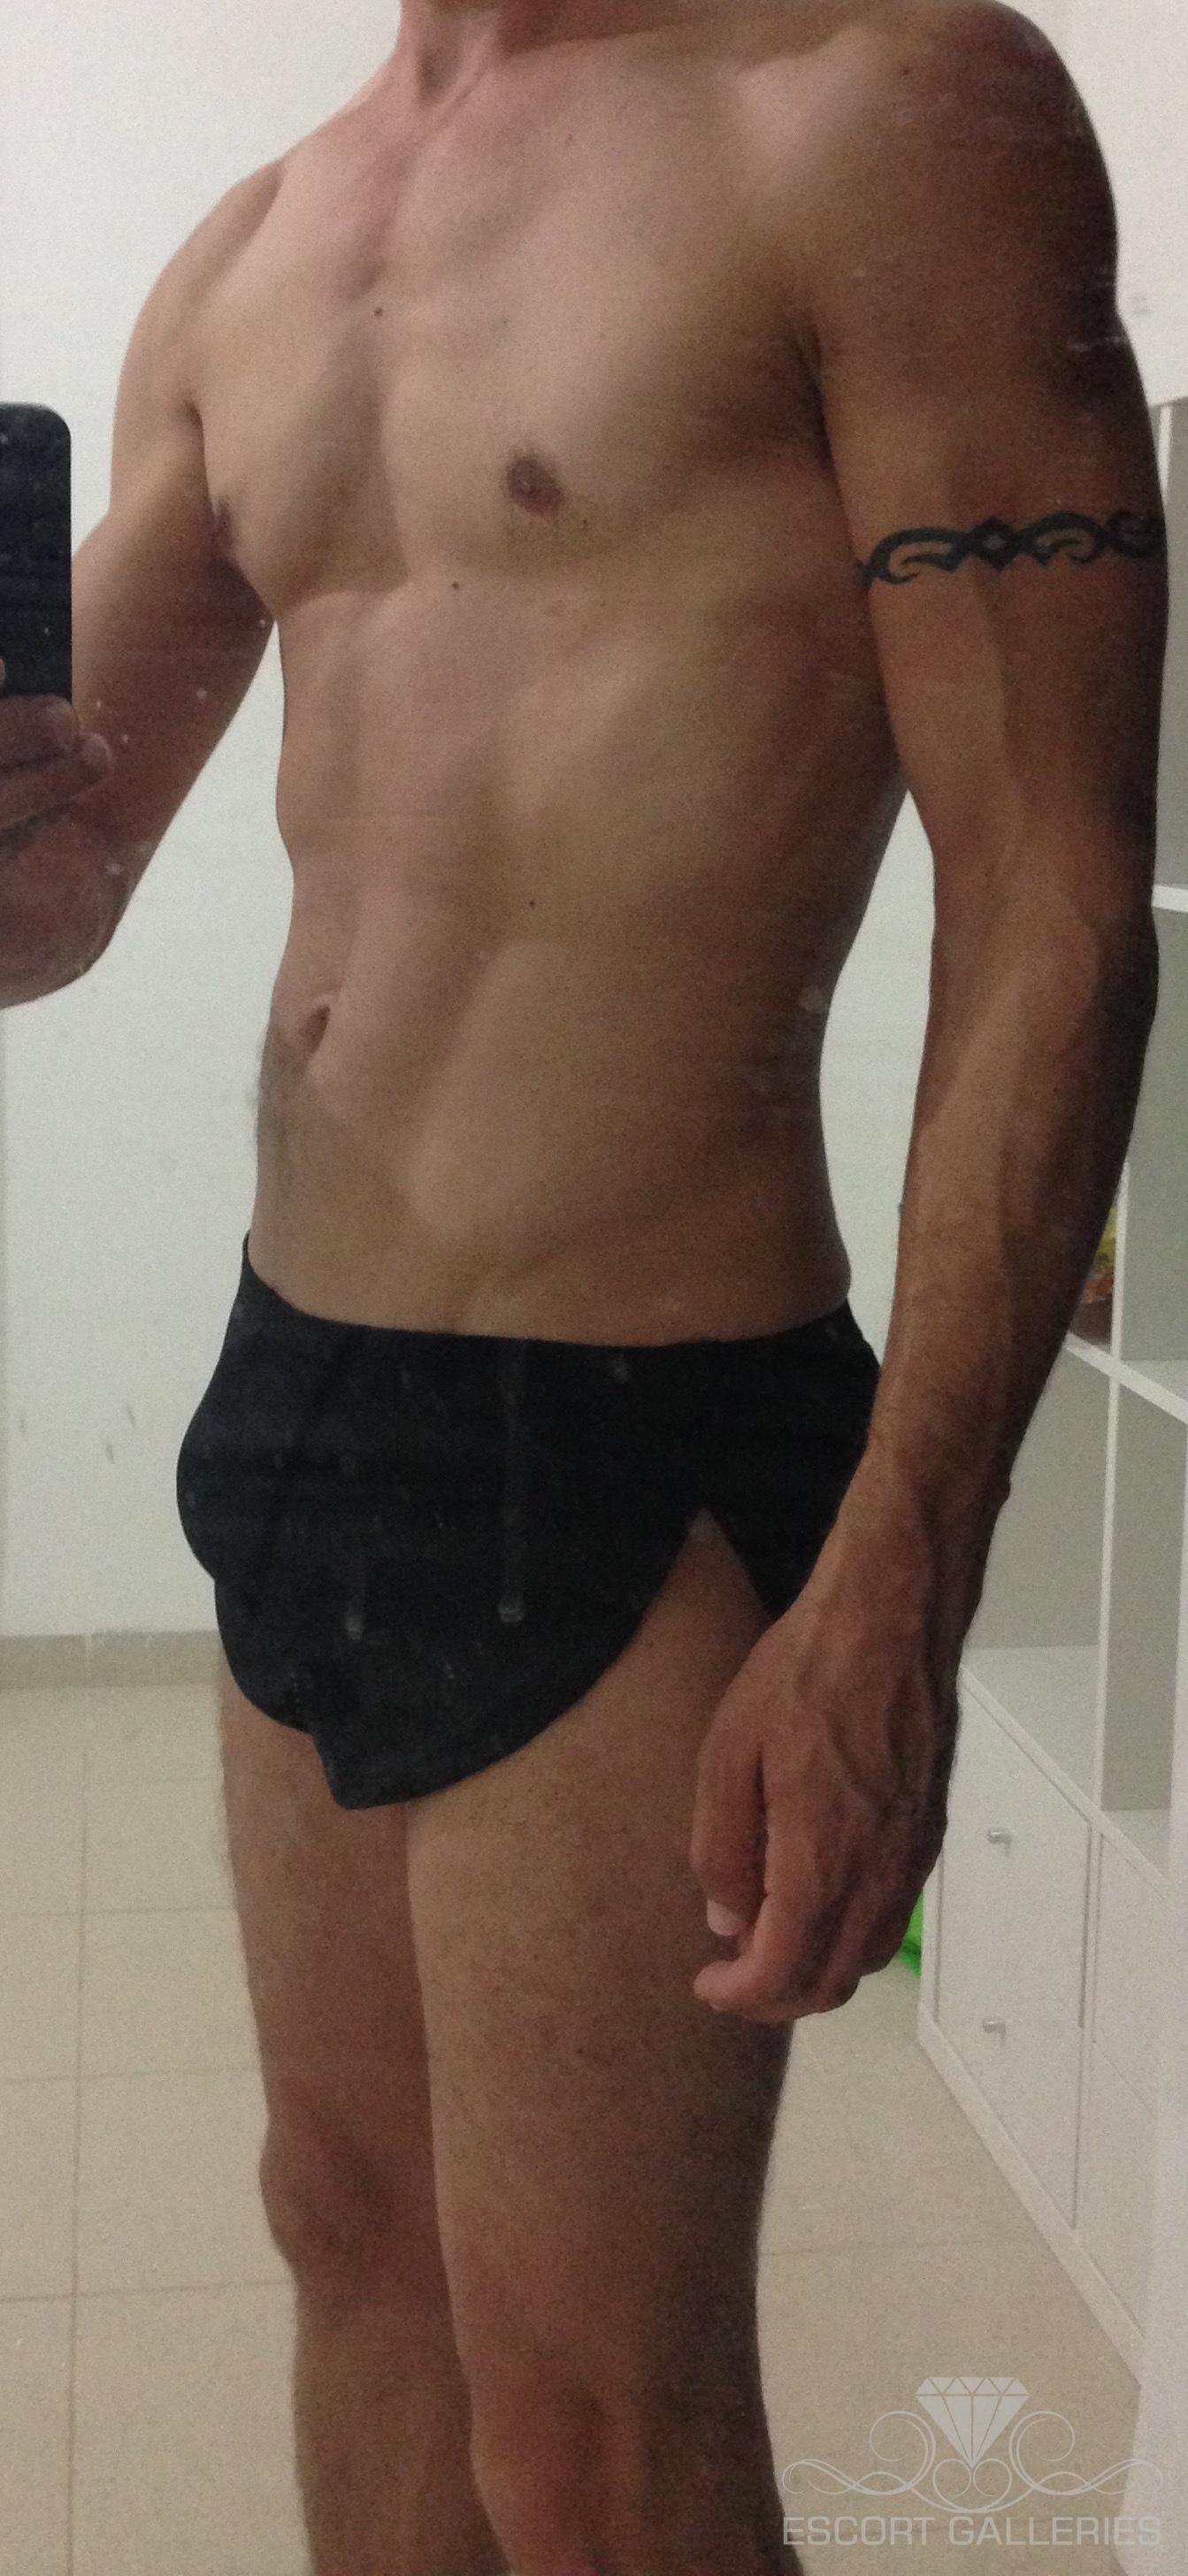 singel dejting homo persisk escort